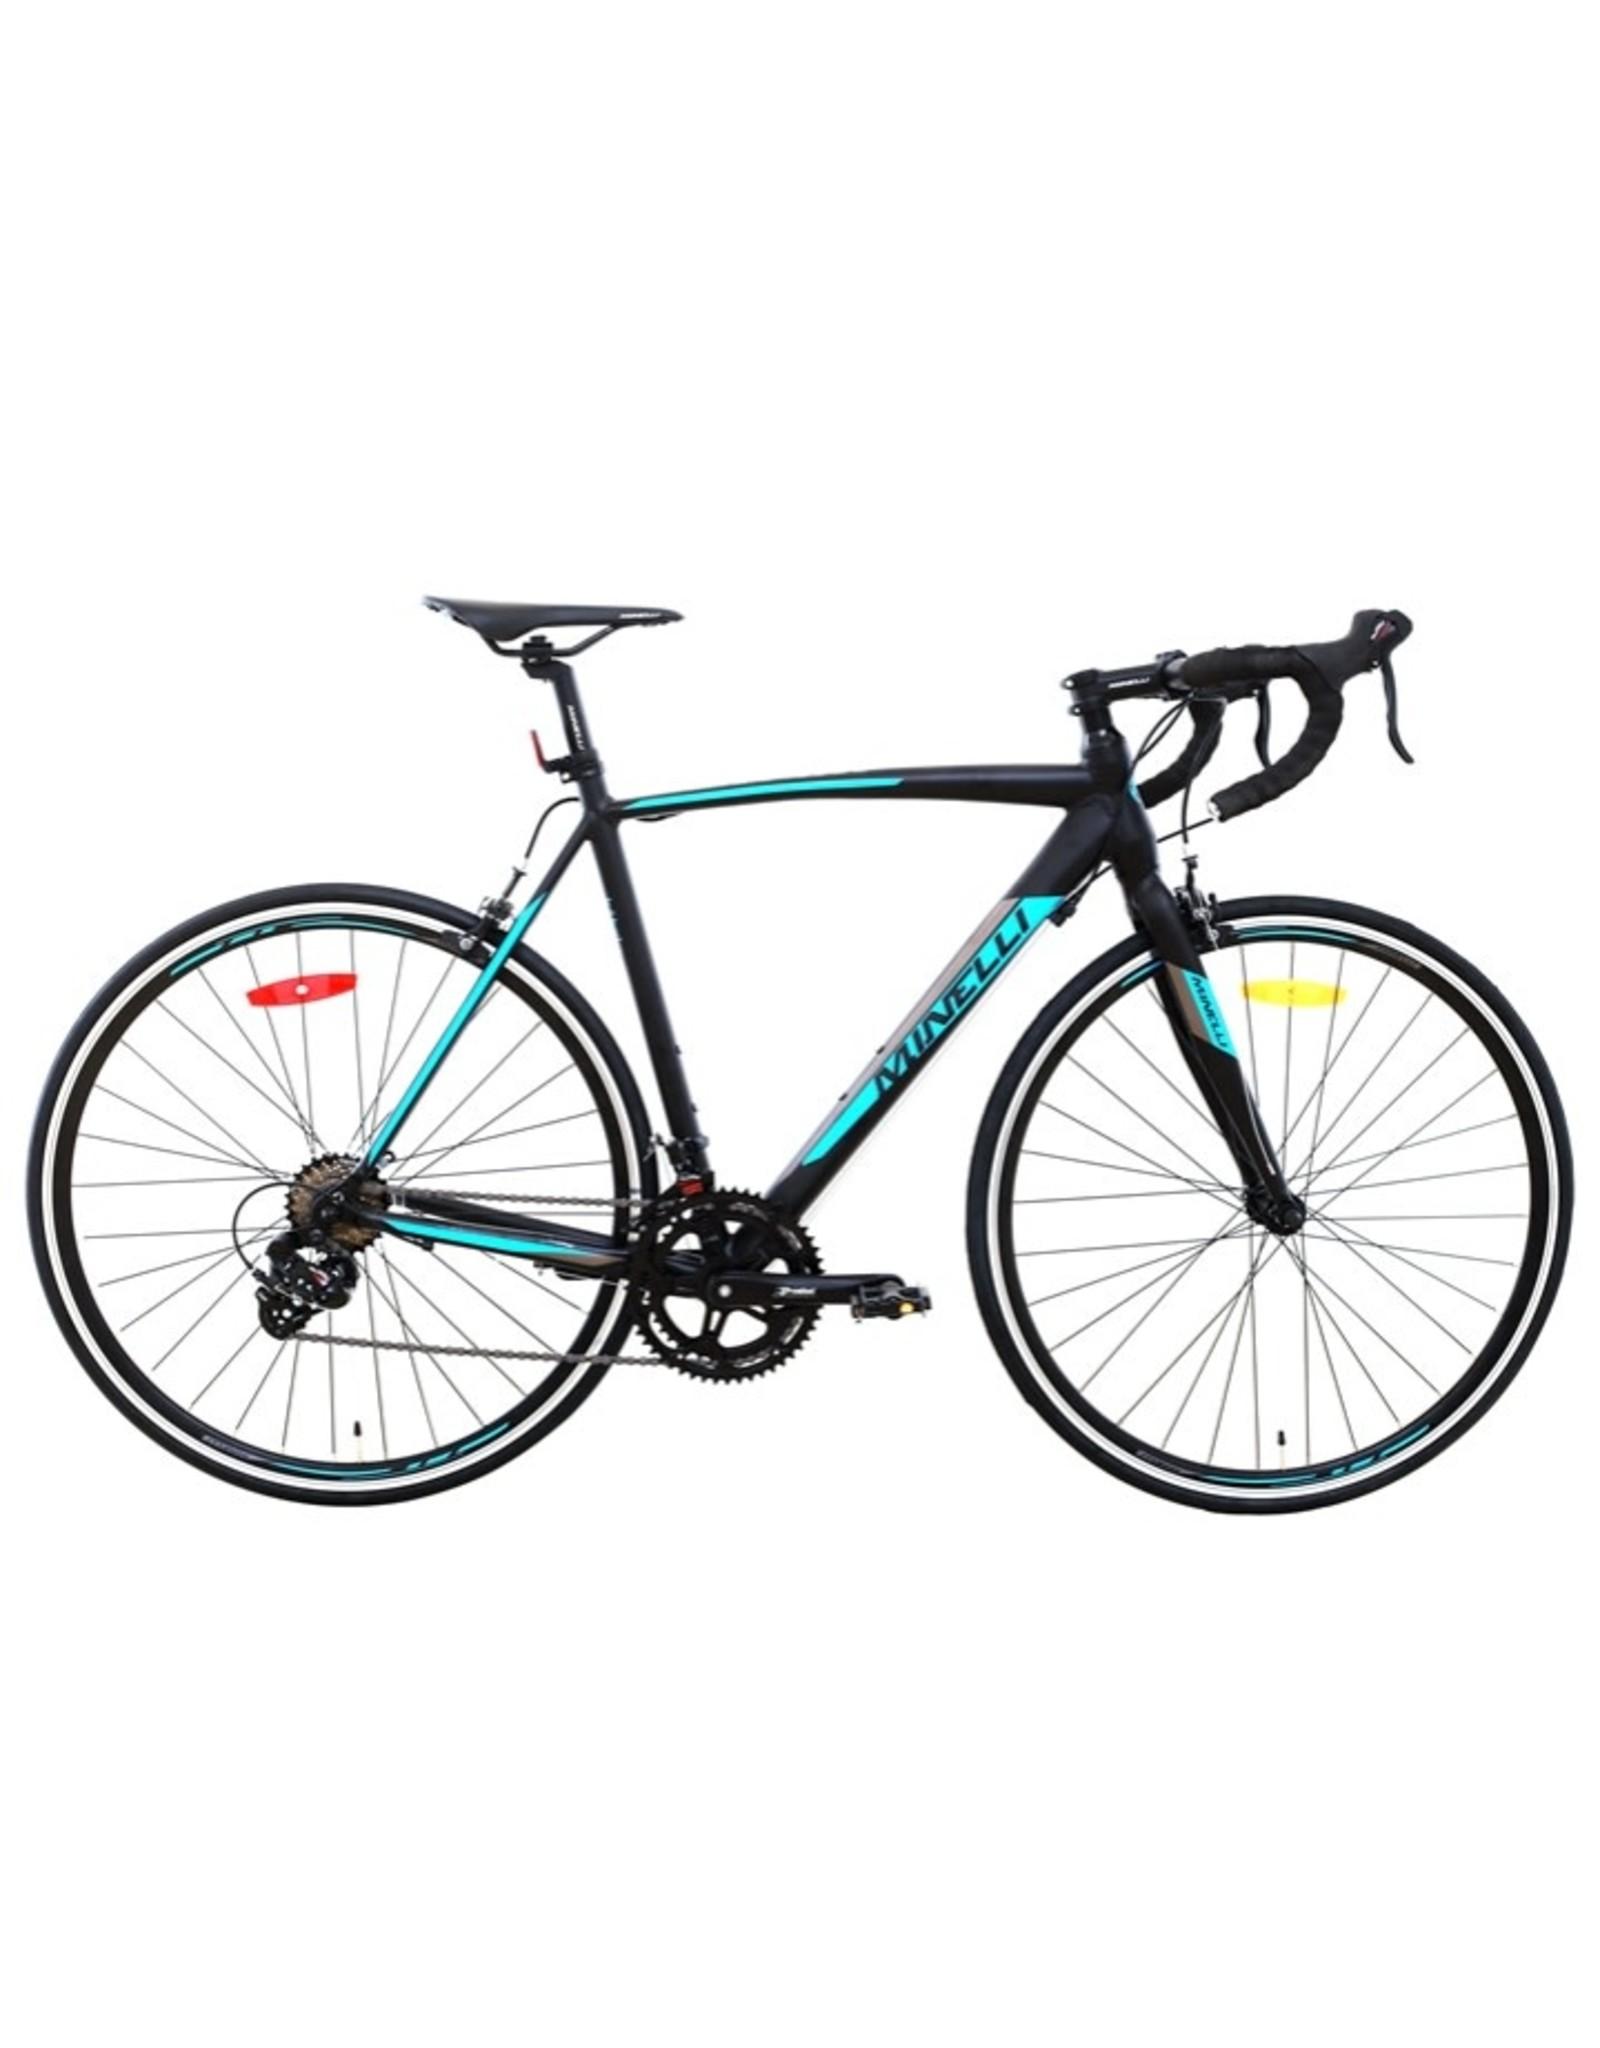 Minelli Road Bike - MINELLI Milano